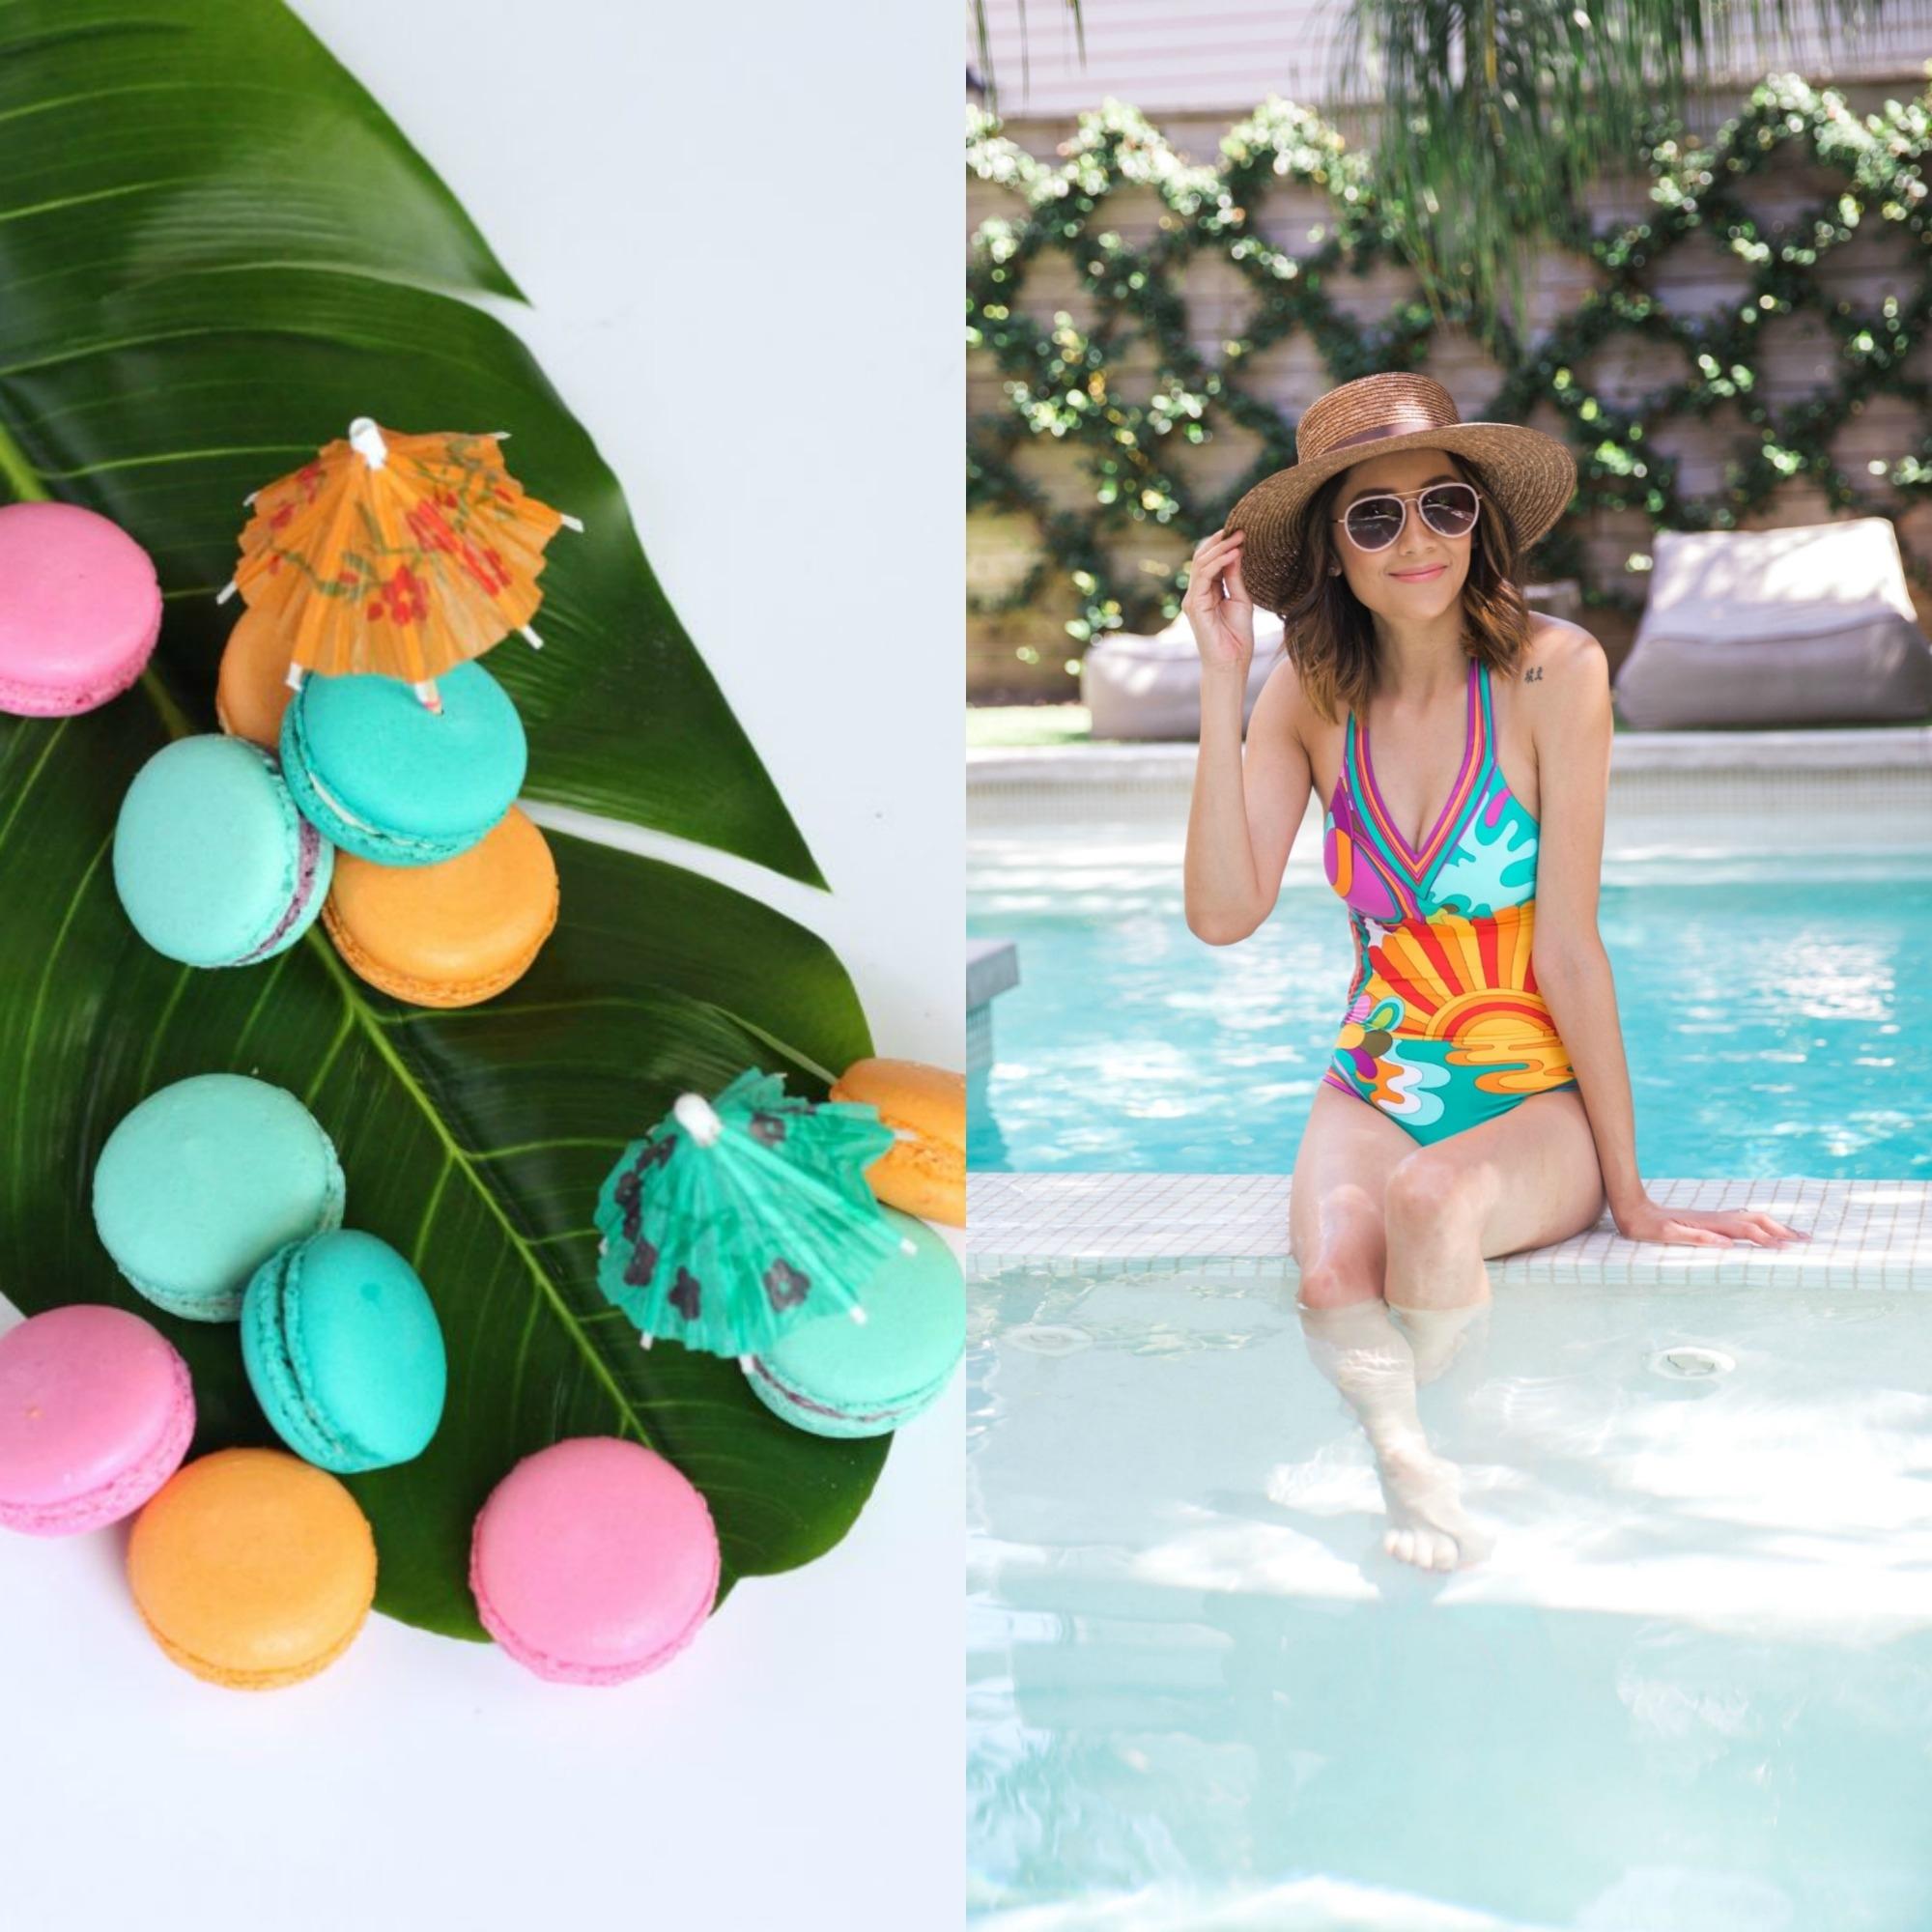 fashion-inspired-desserts-pool-look.jpg